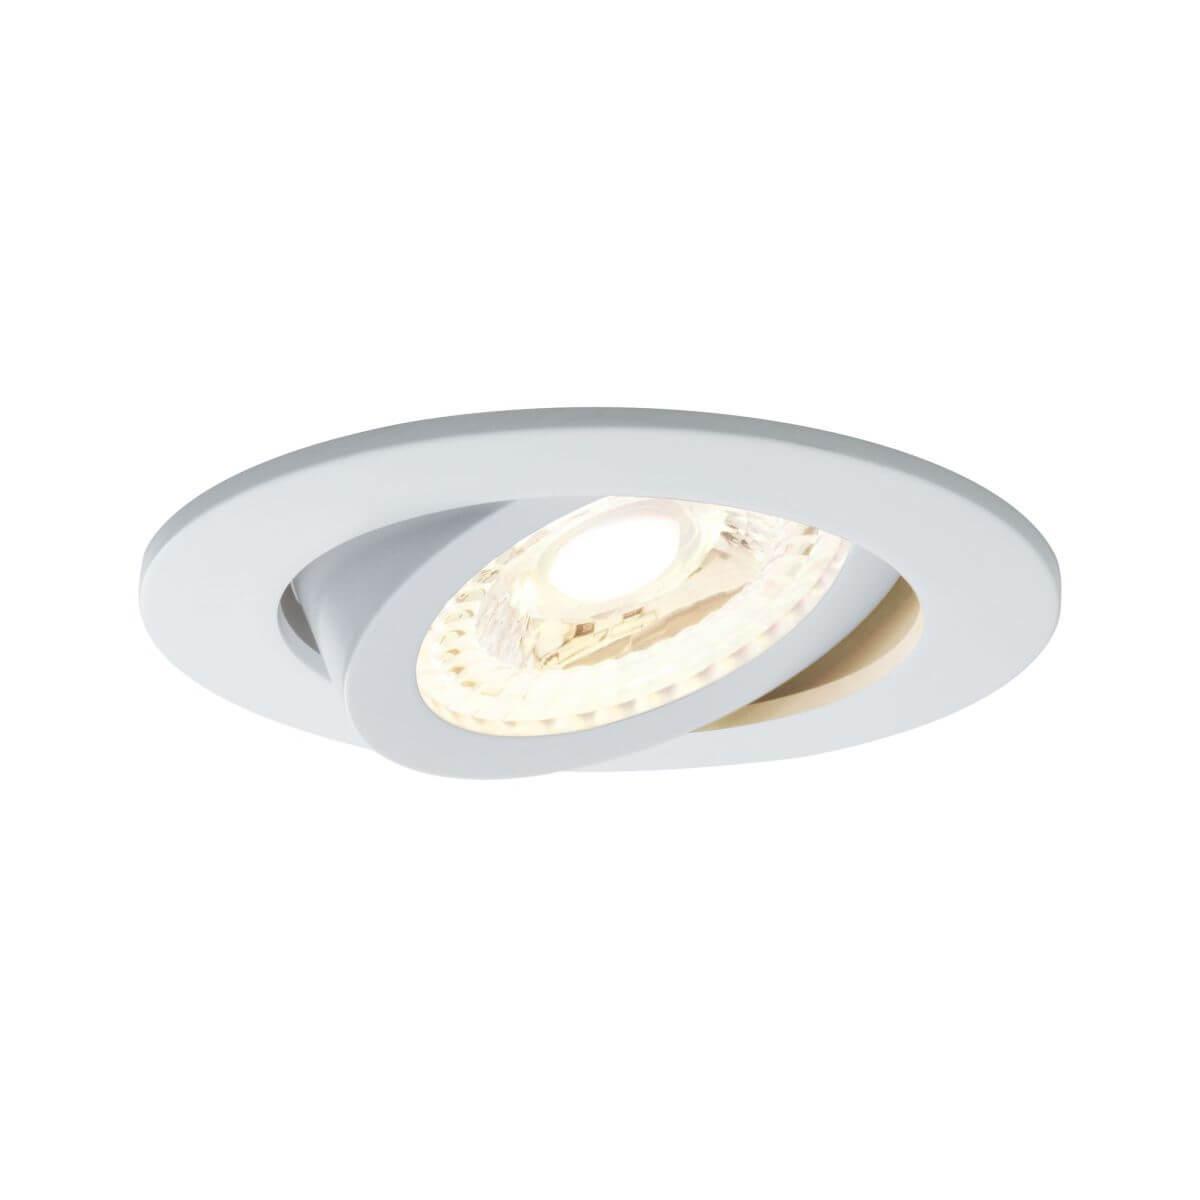 Paulmann SmartHome ZigBee Einbauleuchten-3er Set LED Lens RGBW